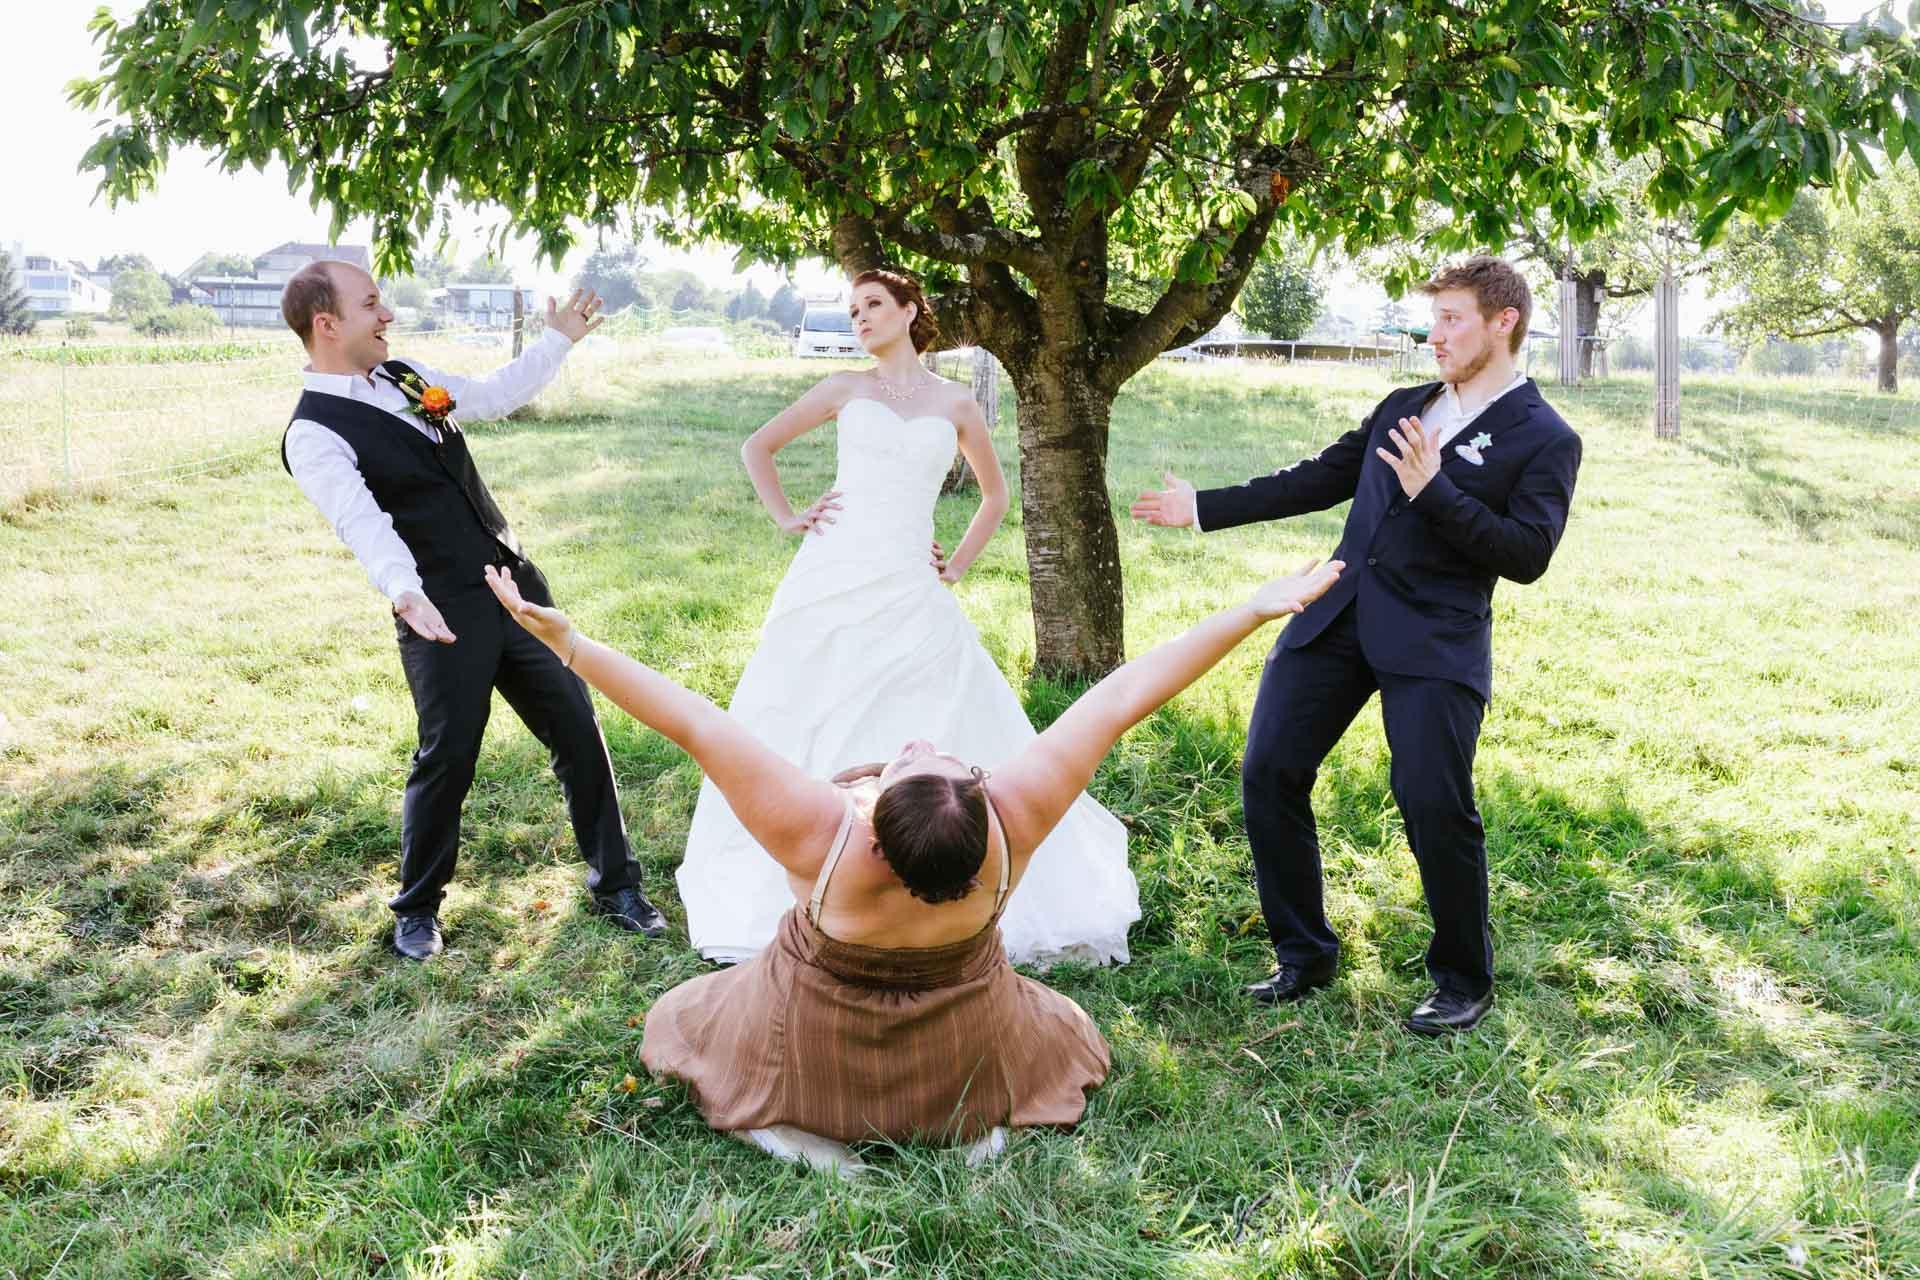 Pixelart_Hochzeitsfotografen_Loerrach_Rheinfelden_Hallwil_Schweiz_Linda-Ramon-1045